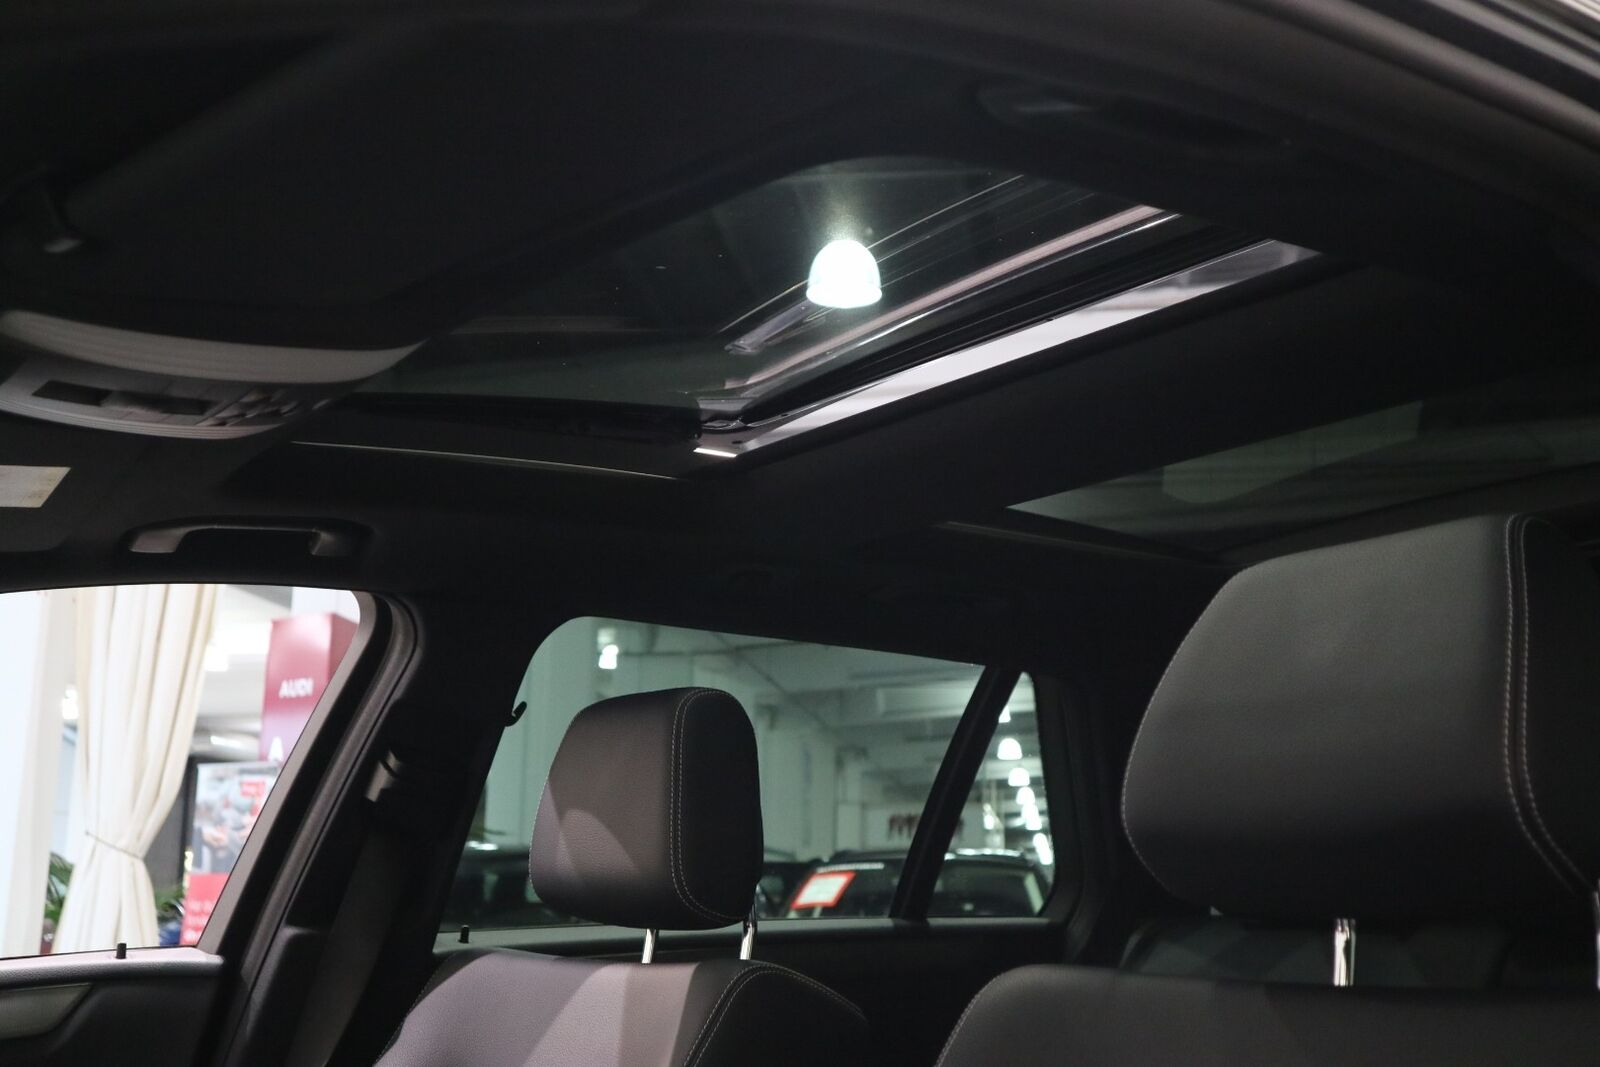 Mercedes E220 2,2 CDi Avantgarde AMG stc. aut. - billede 5